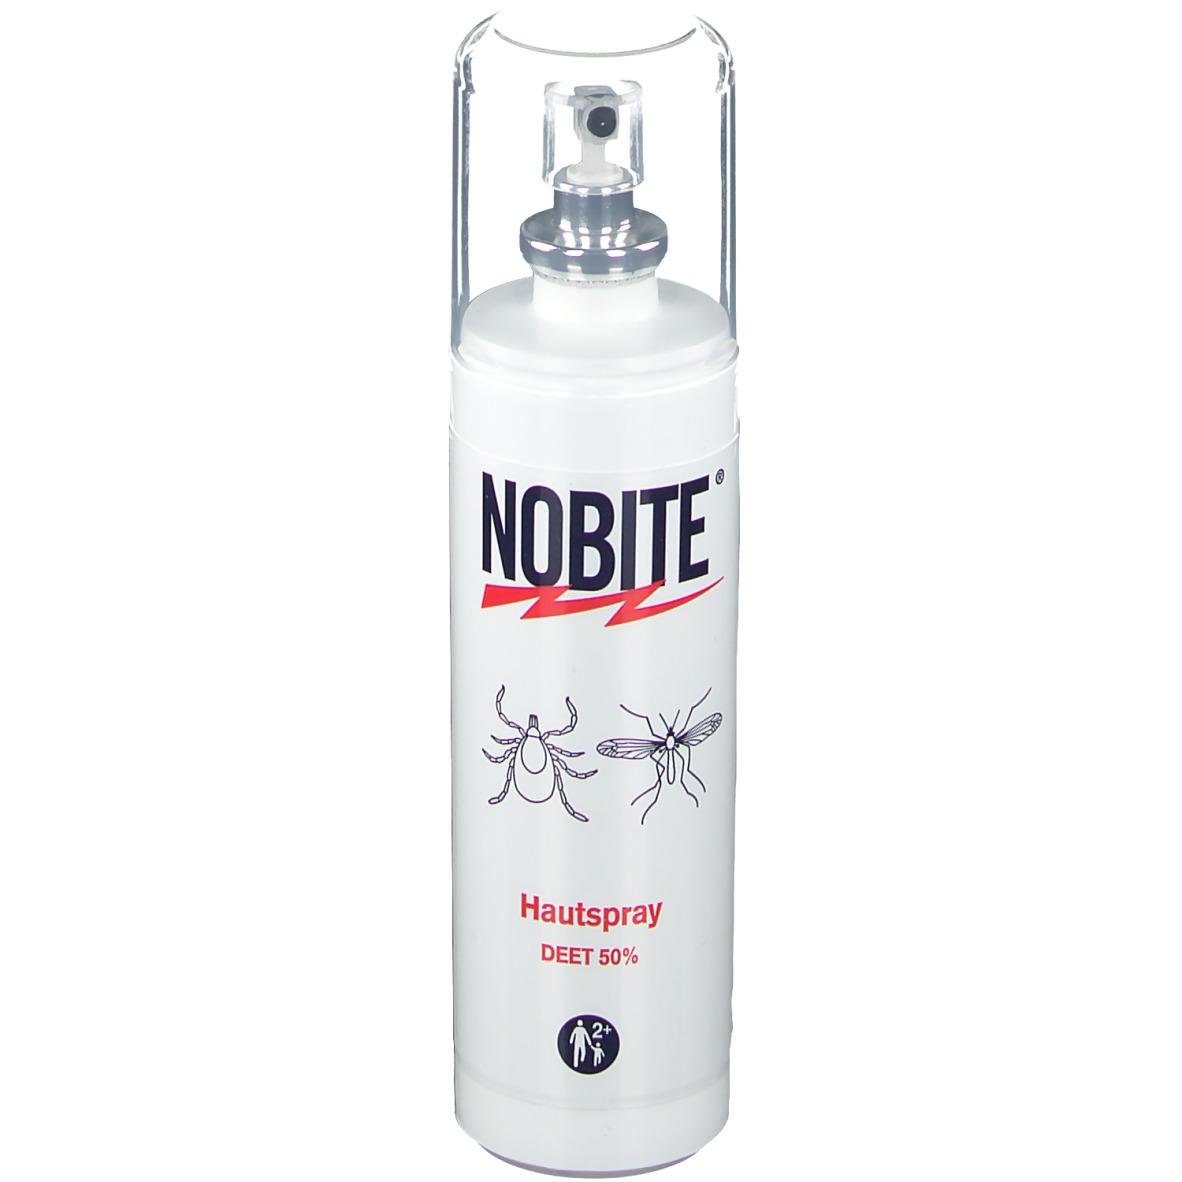 Nobite® Hautspray 100 ml Spray